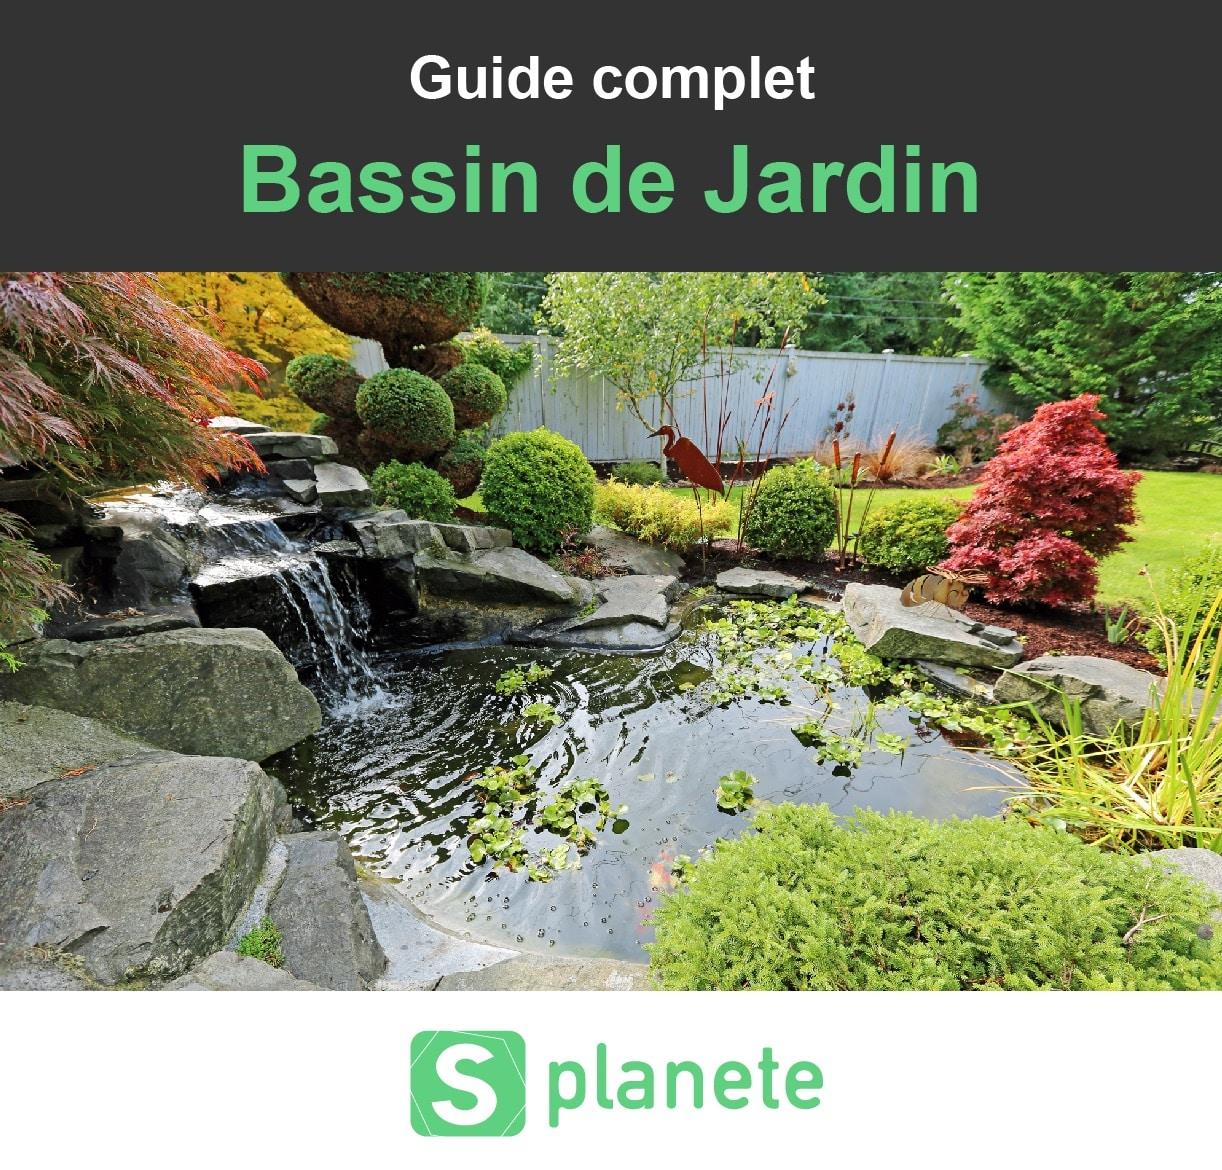 Bassin De Jardin : Construire, Aménager Et Entretenir ... tout Construire Un Bassin De Jardin